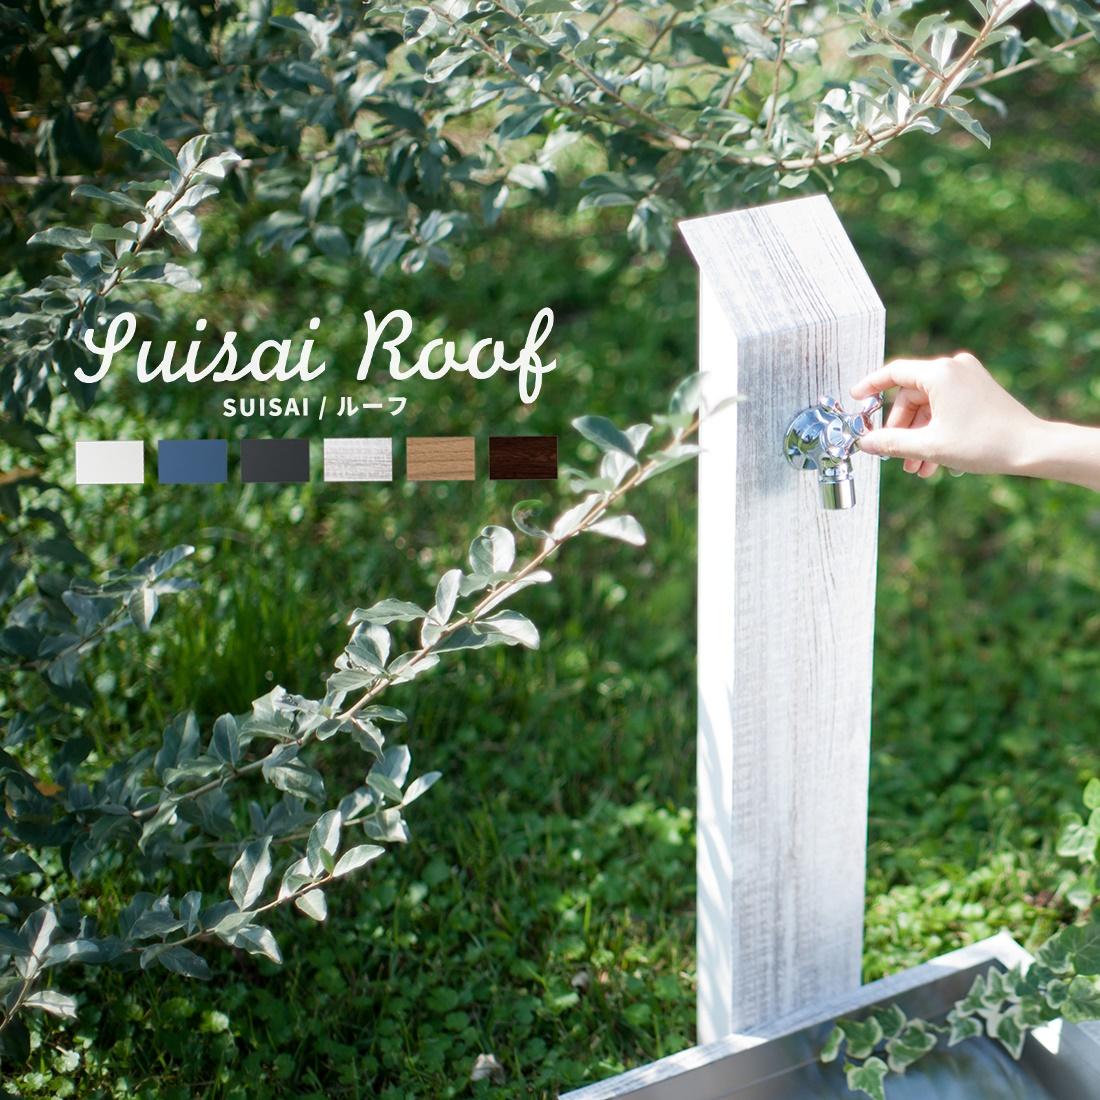 【nido ニド】SUISAI スイサイ ルーフ 本体+パネル立水栓 水栓柱 ガーデン 庭 水道 エクステリア